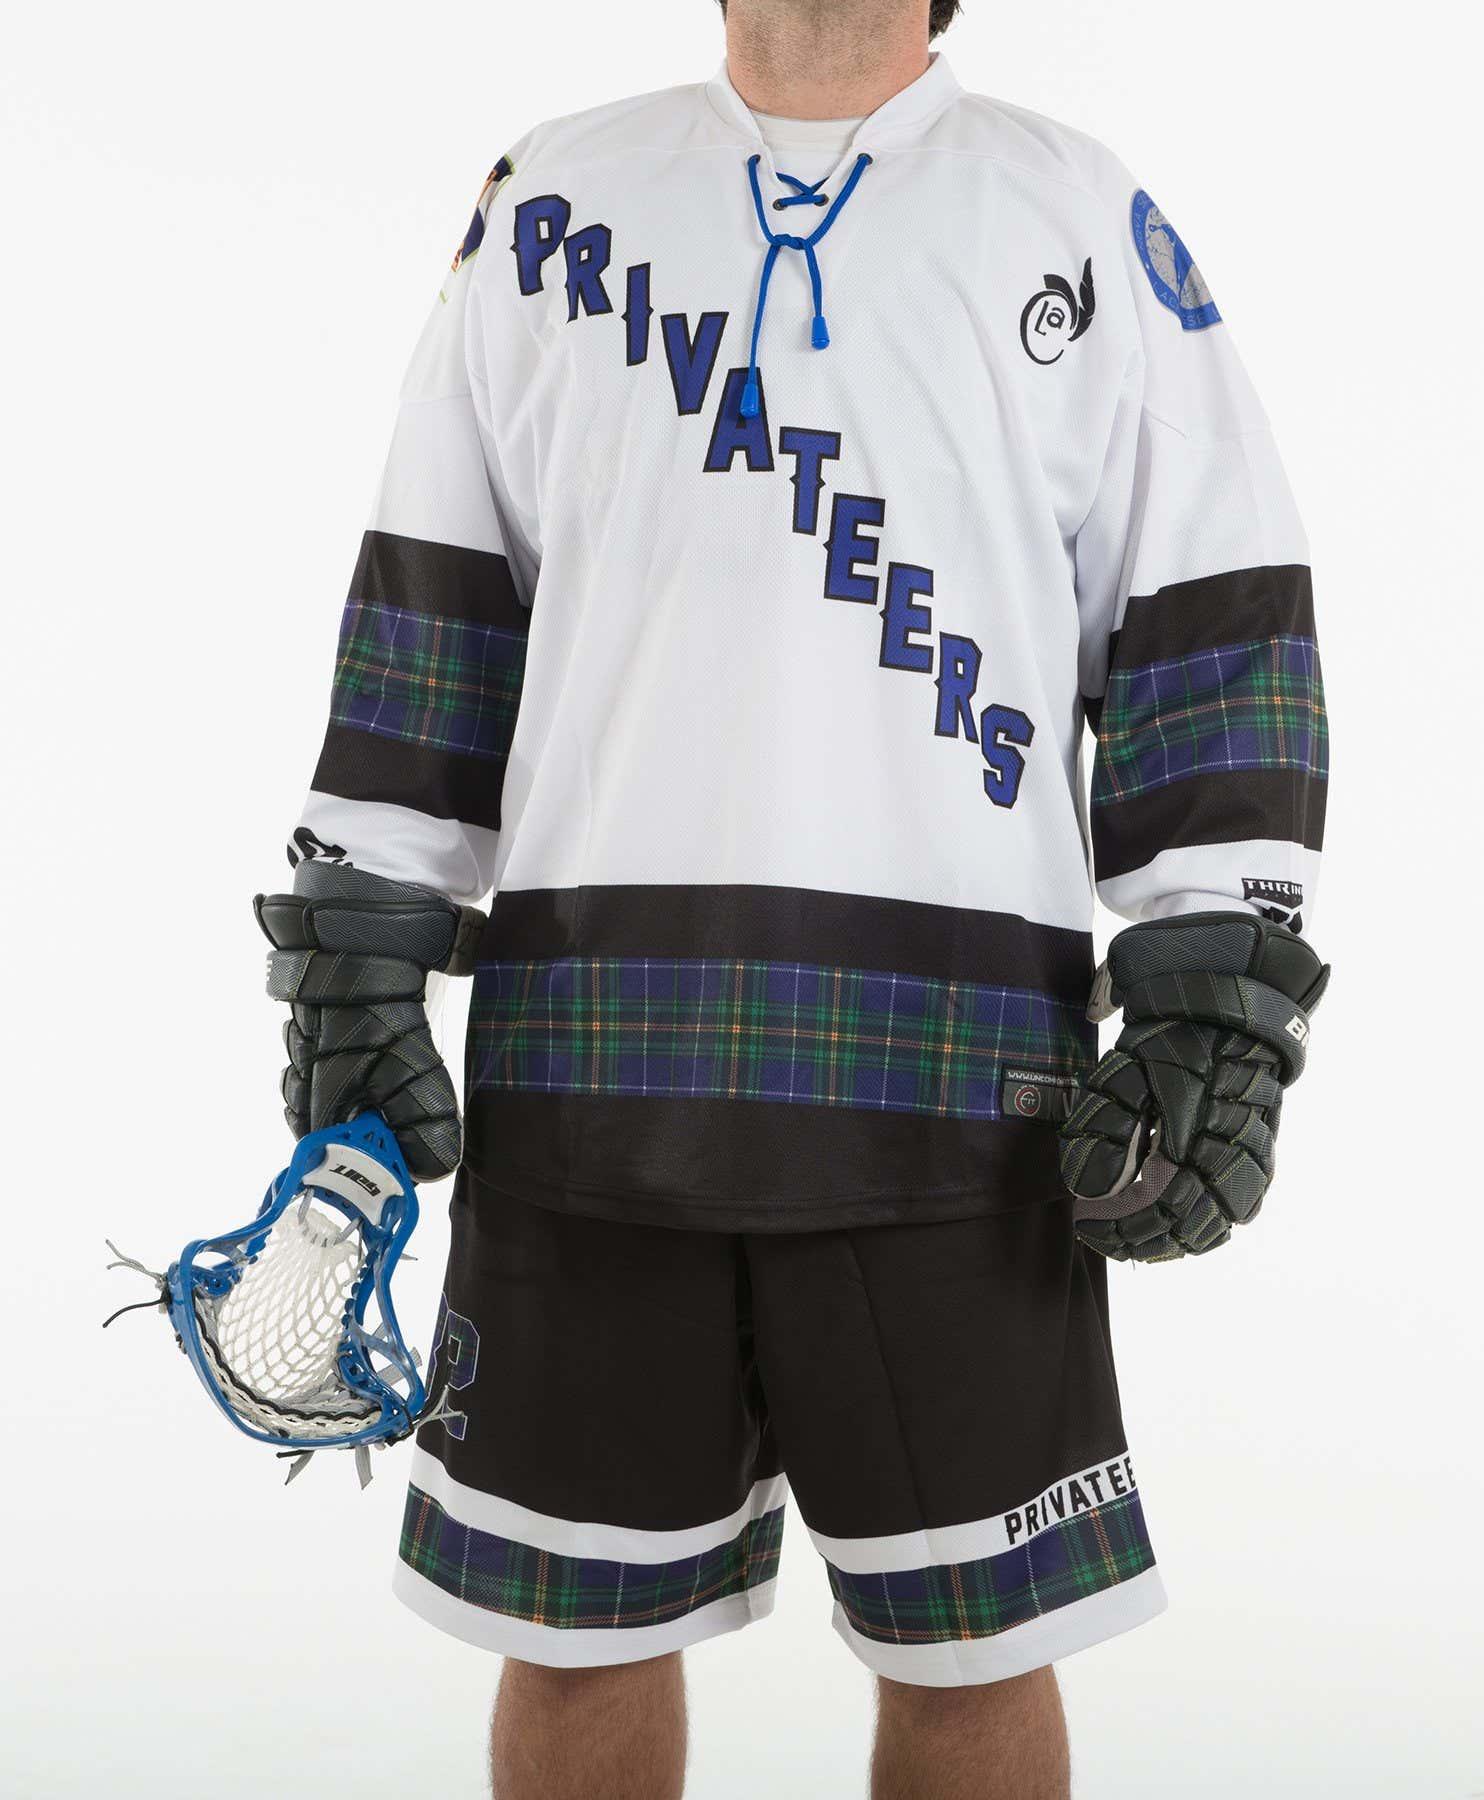 novascotia-privateers-jersey